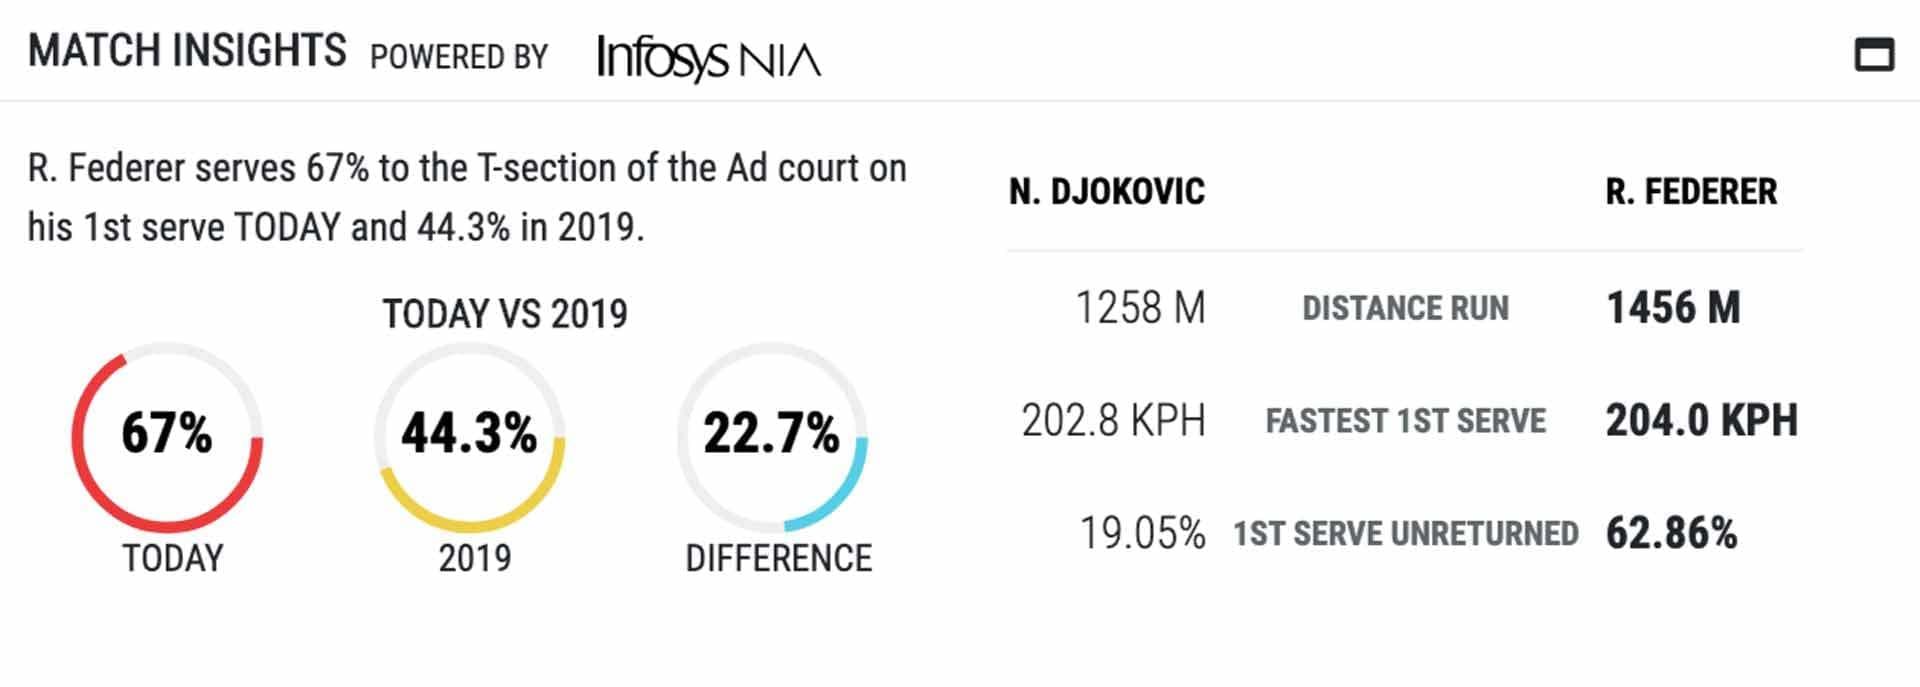 Infosys ATP Scores & Stats analysis